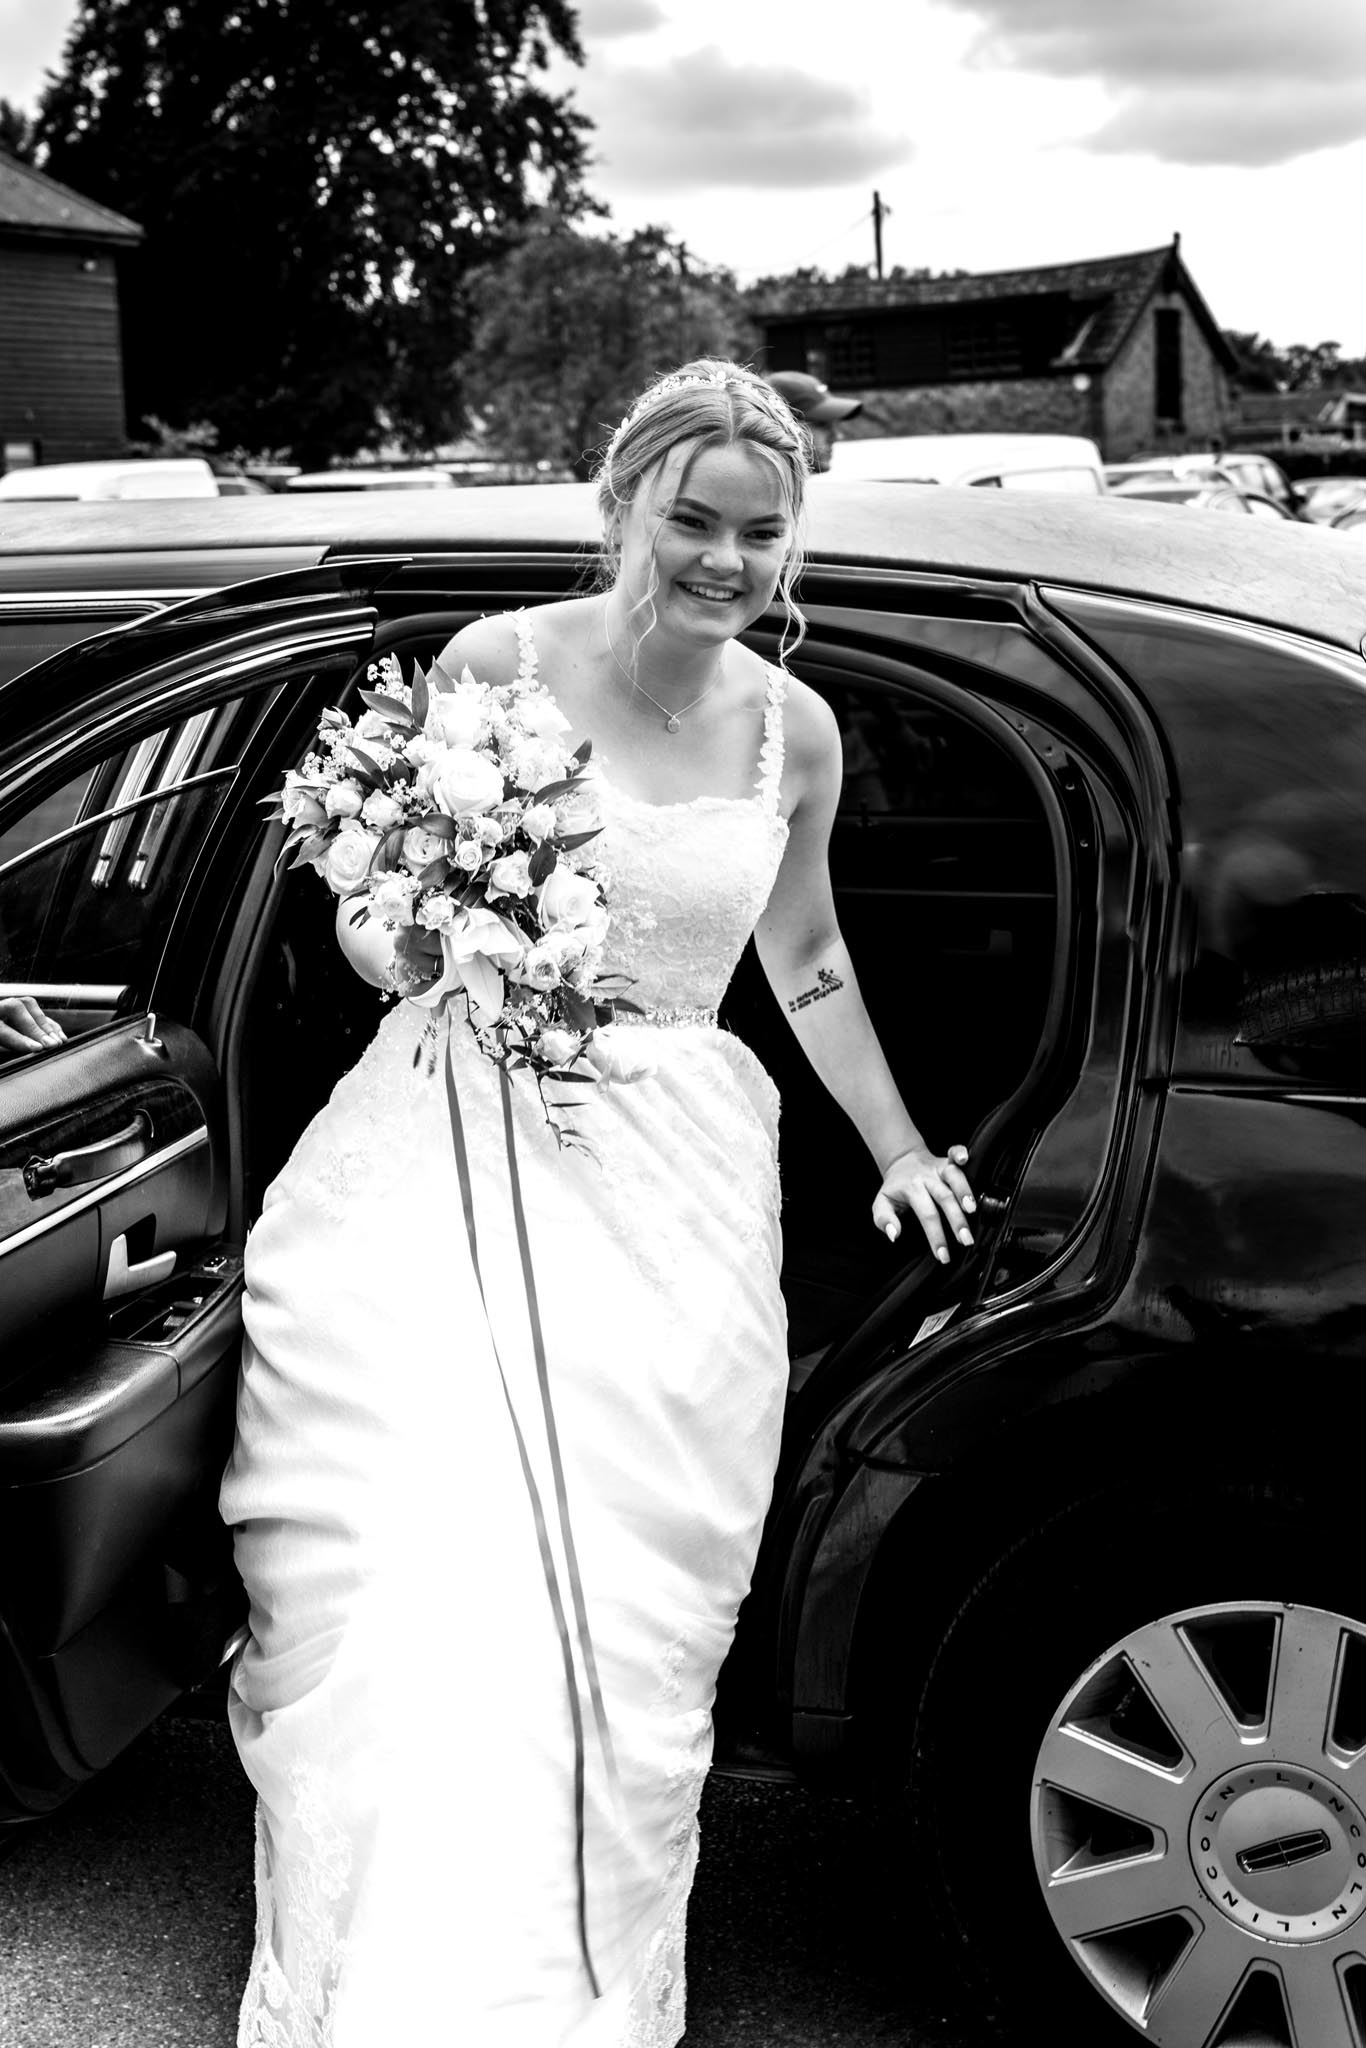 218-Arrivals-Luke-Yasmin-The-Rayleigh-Club-Wedding-Photography.jpg